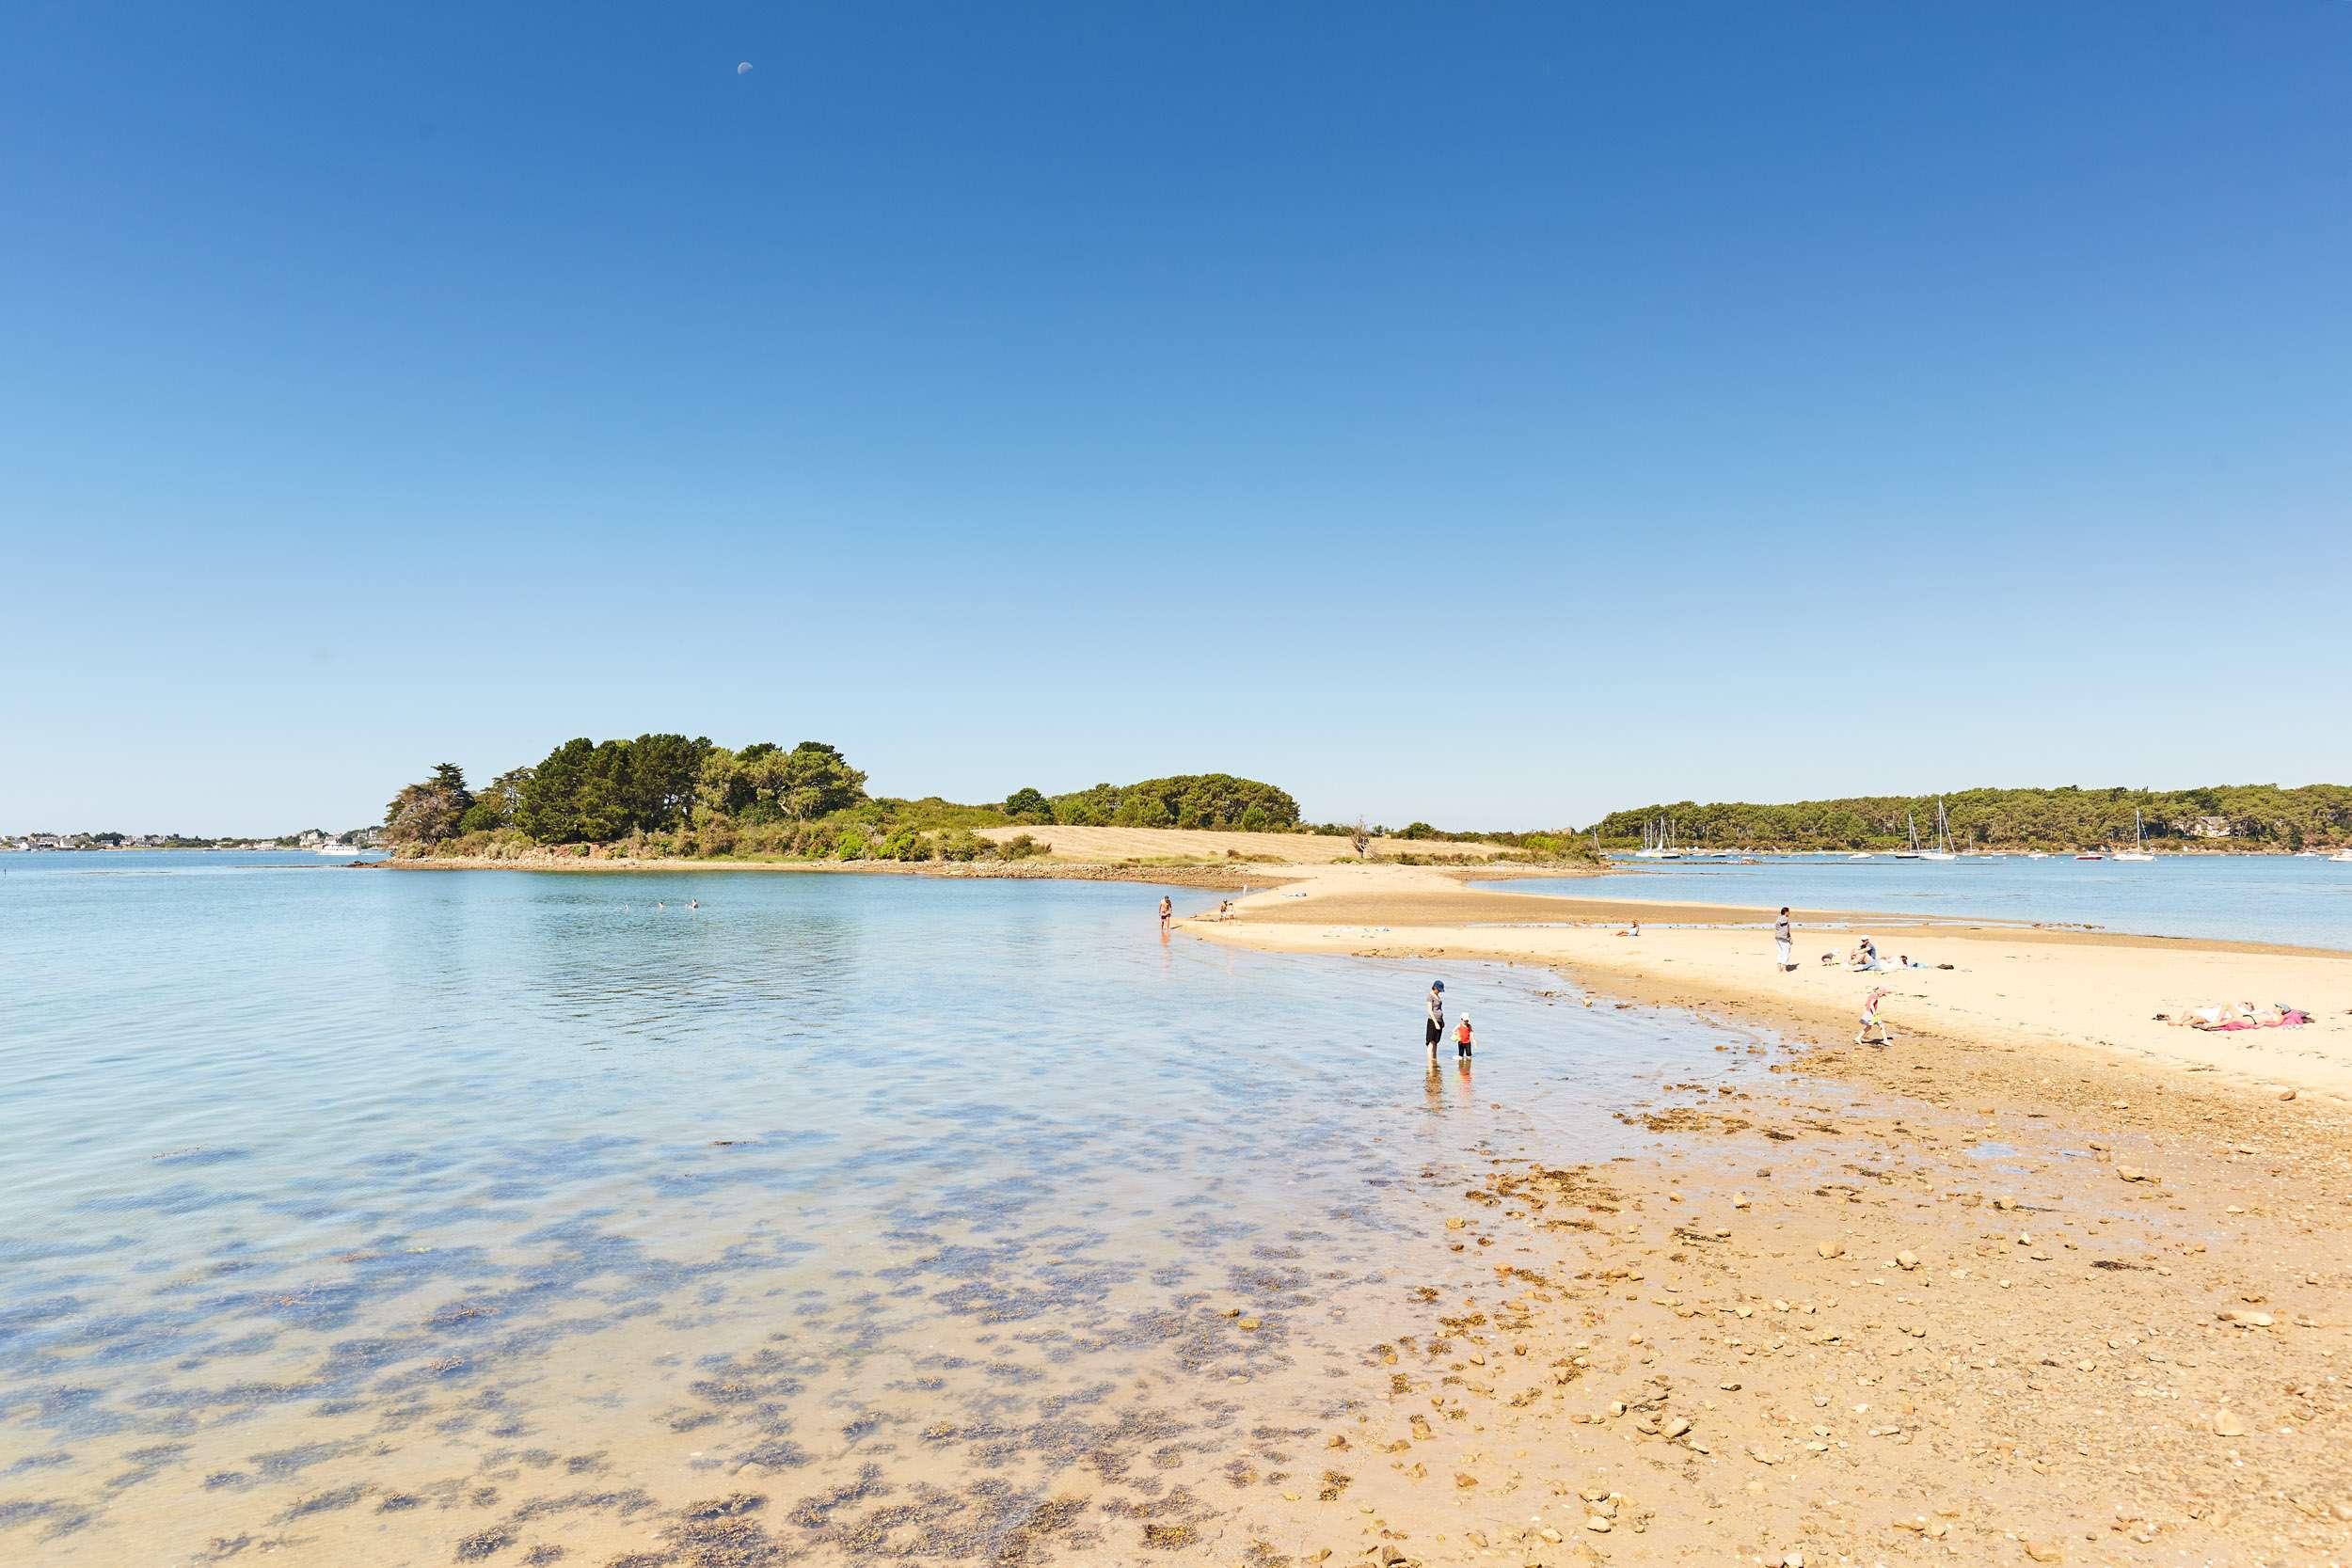 Plage-Les-7-les-Baden-Golfe-du-Morbihan-Bretagne-sud